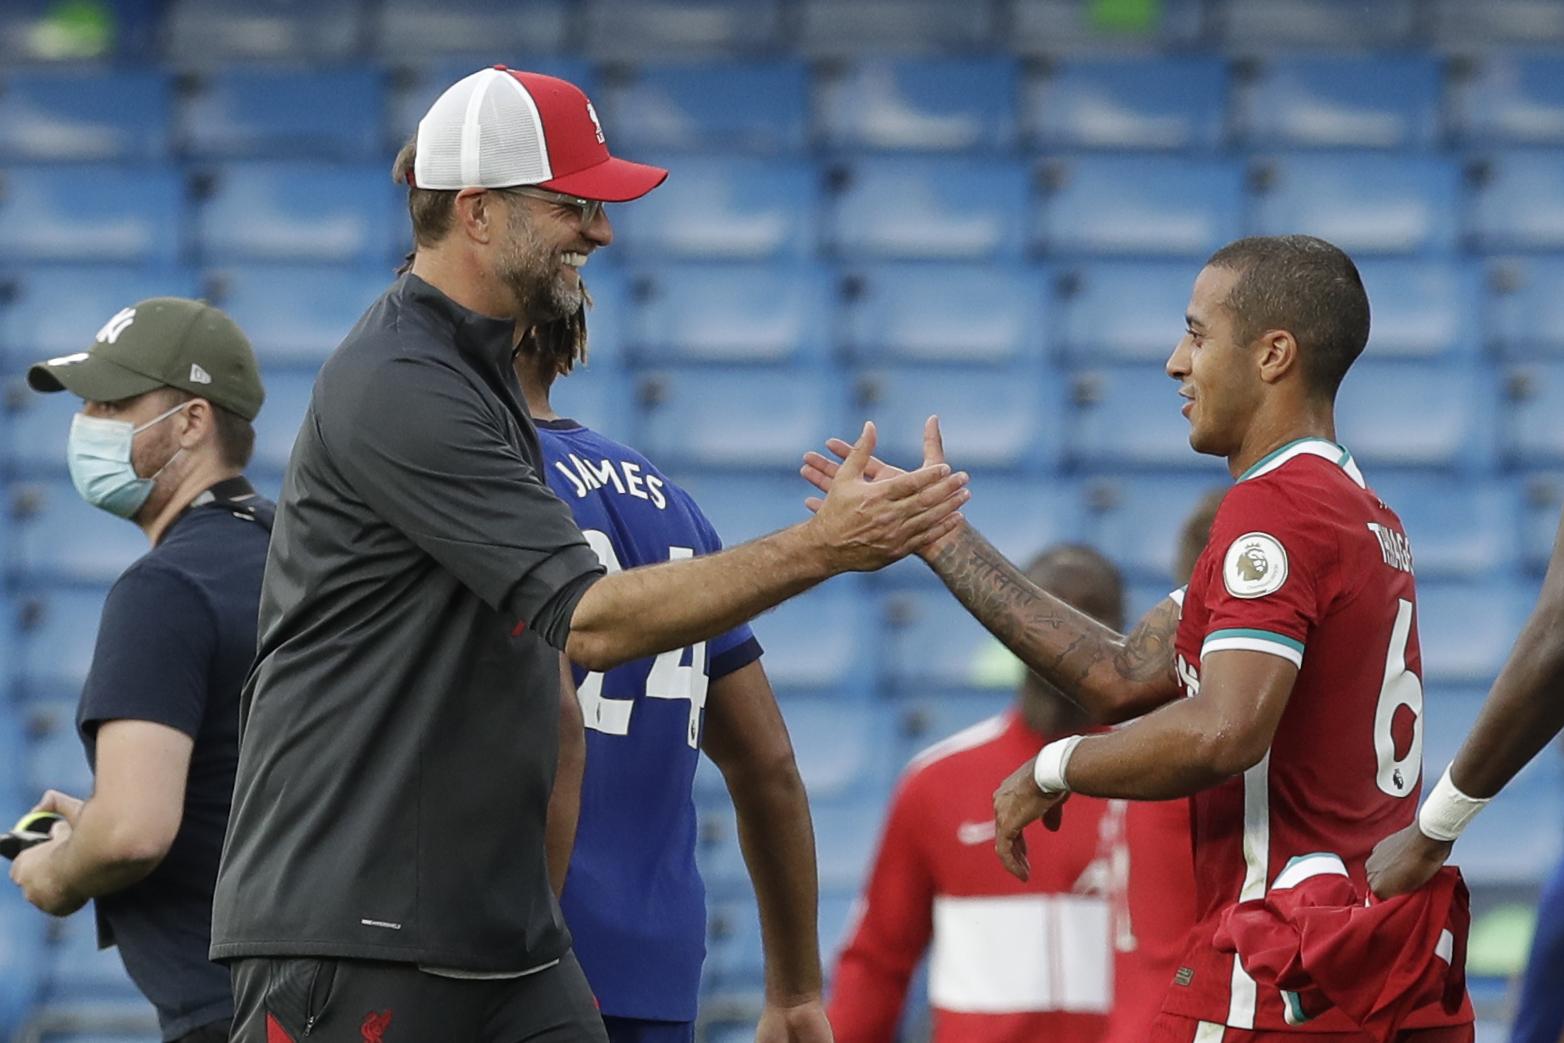 Spitzenspiel in der Premier League: Der FC Chelsea gegen den FC Liverpool.